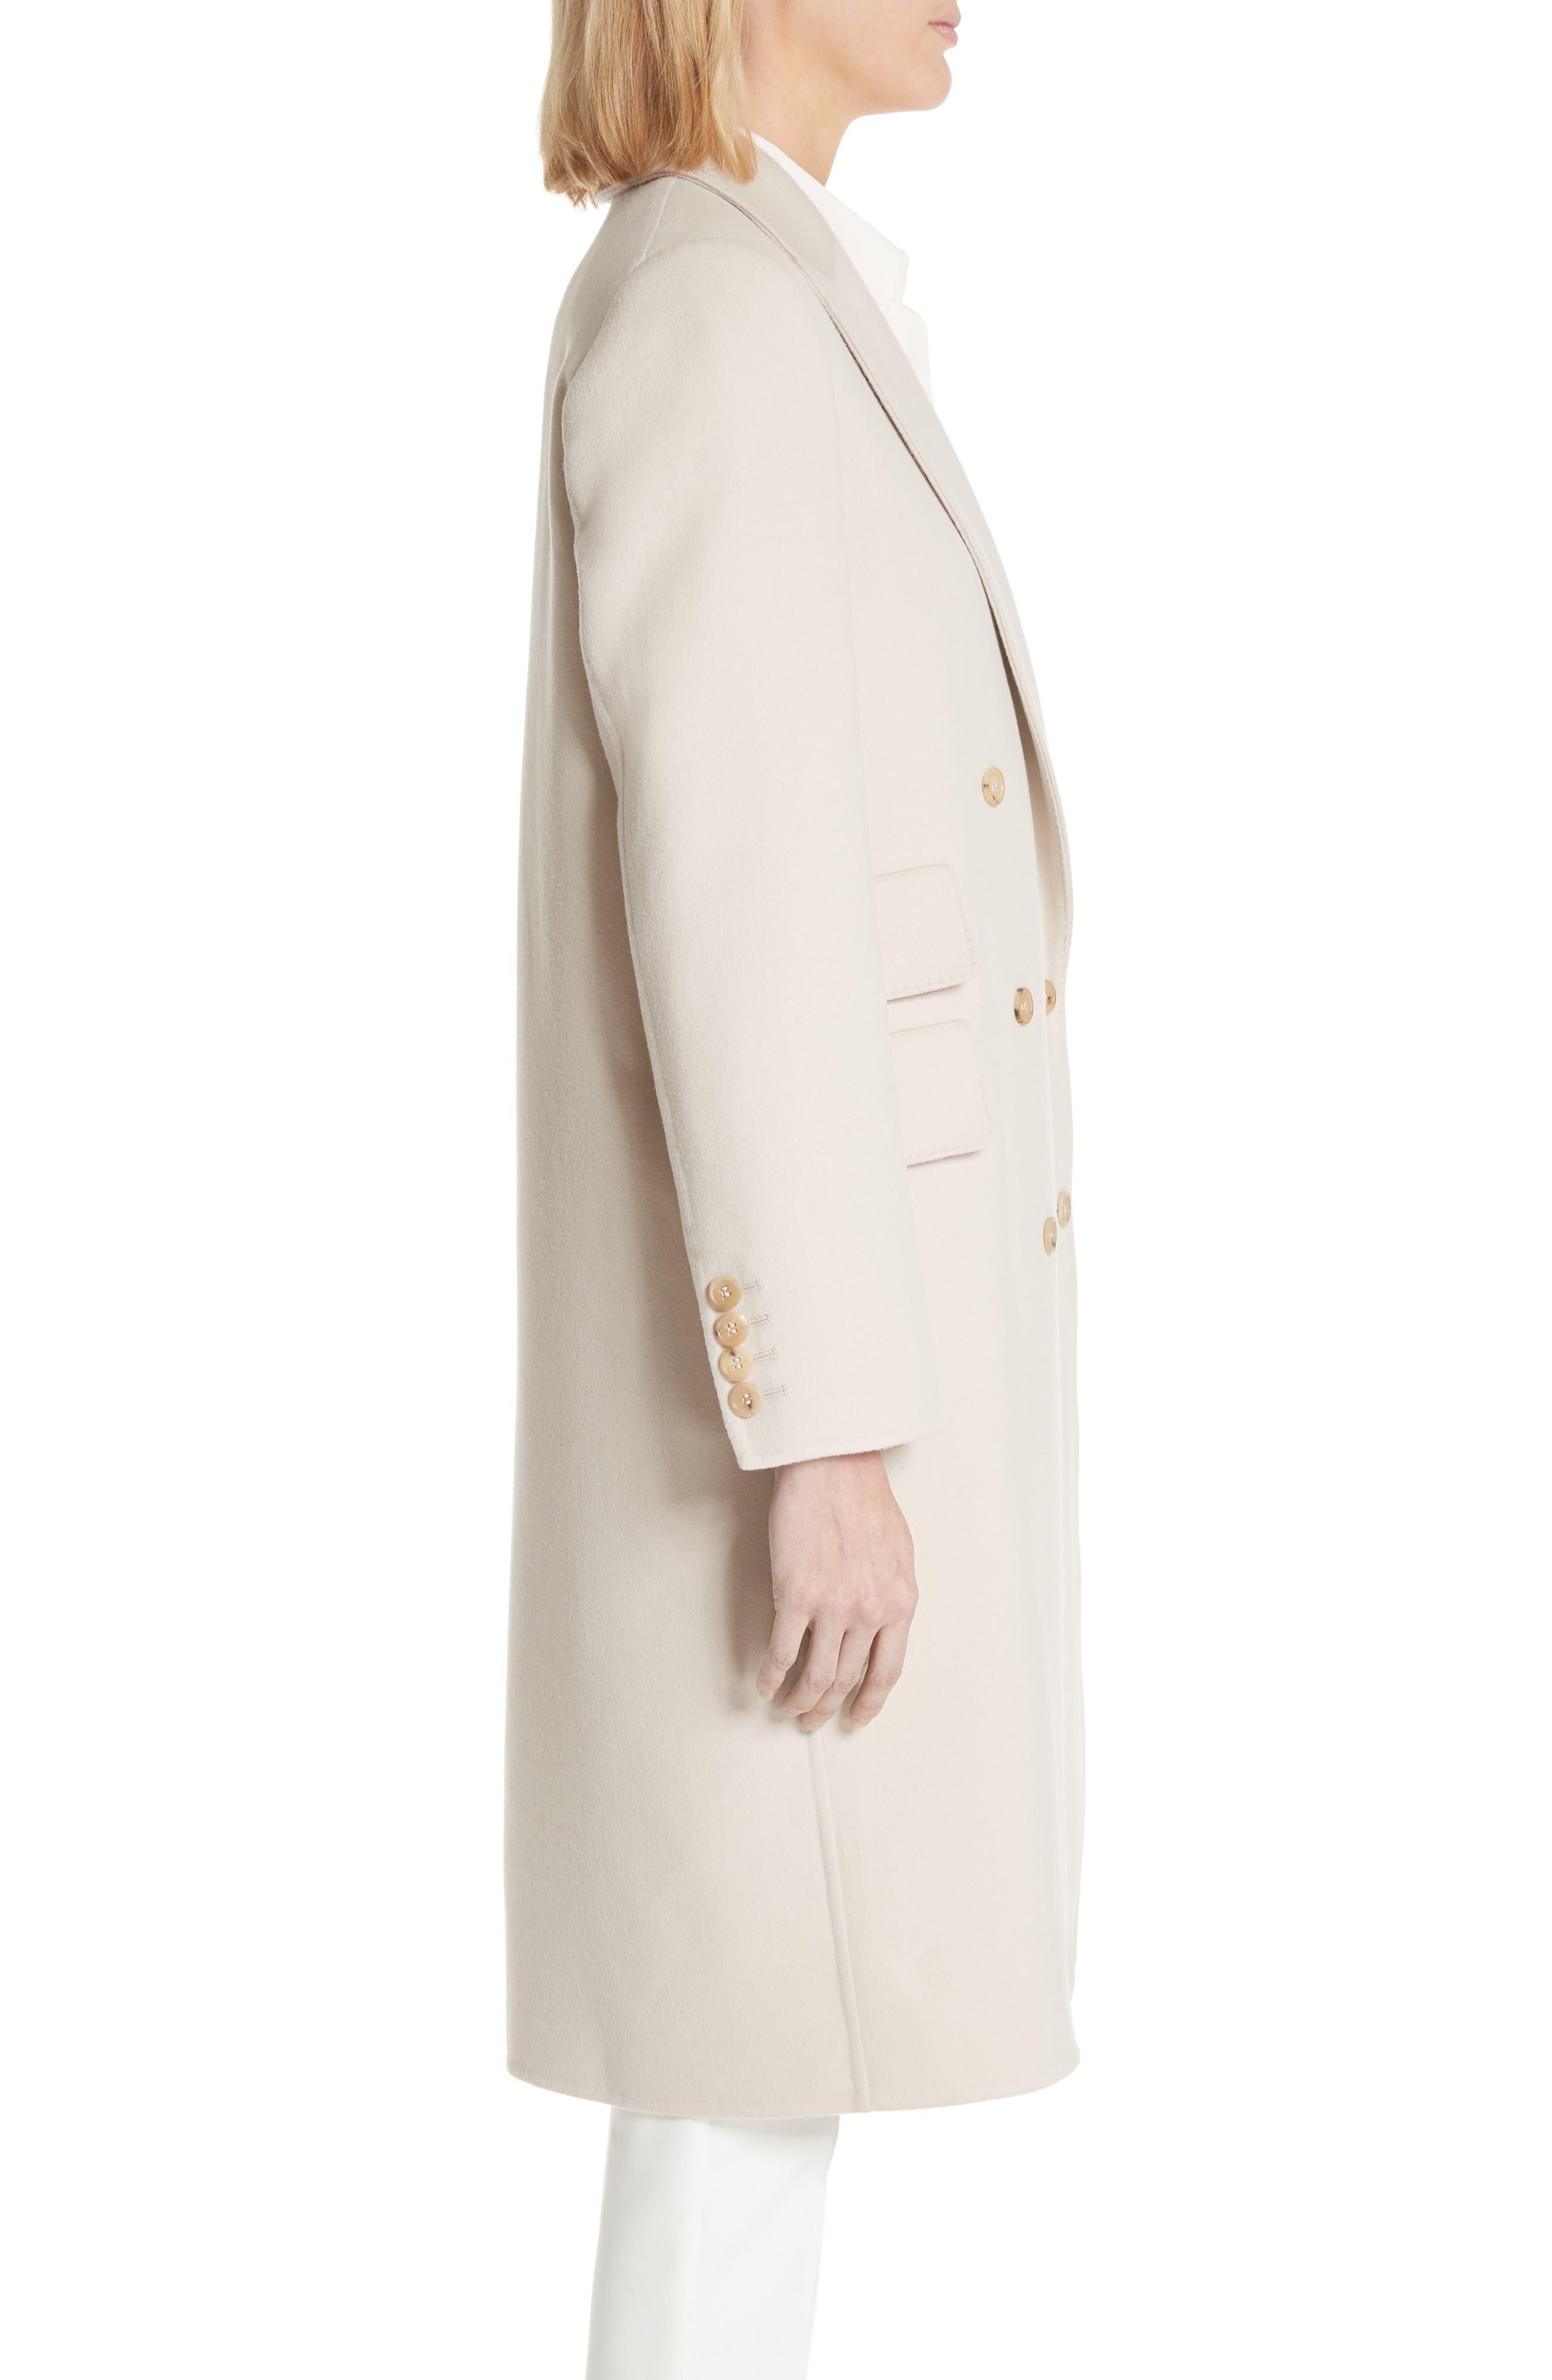 Armonia Wool & Cashmere Coat,                             Alternate thumbnail 3, color,                             906